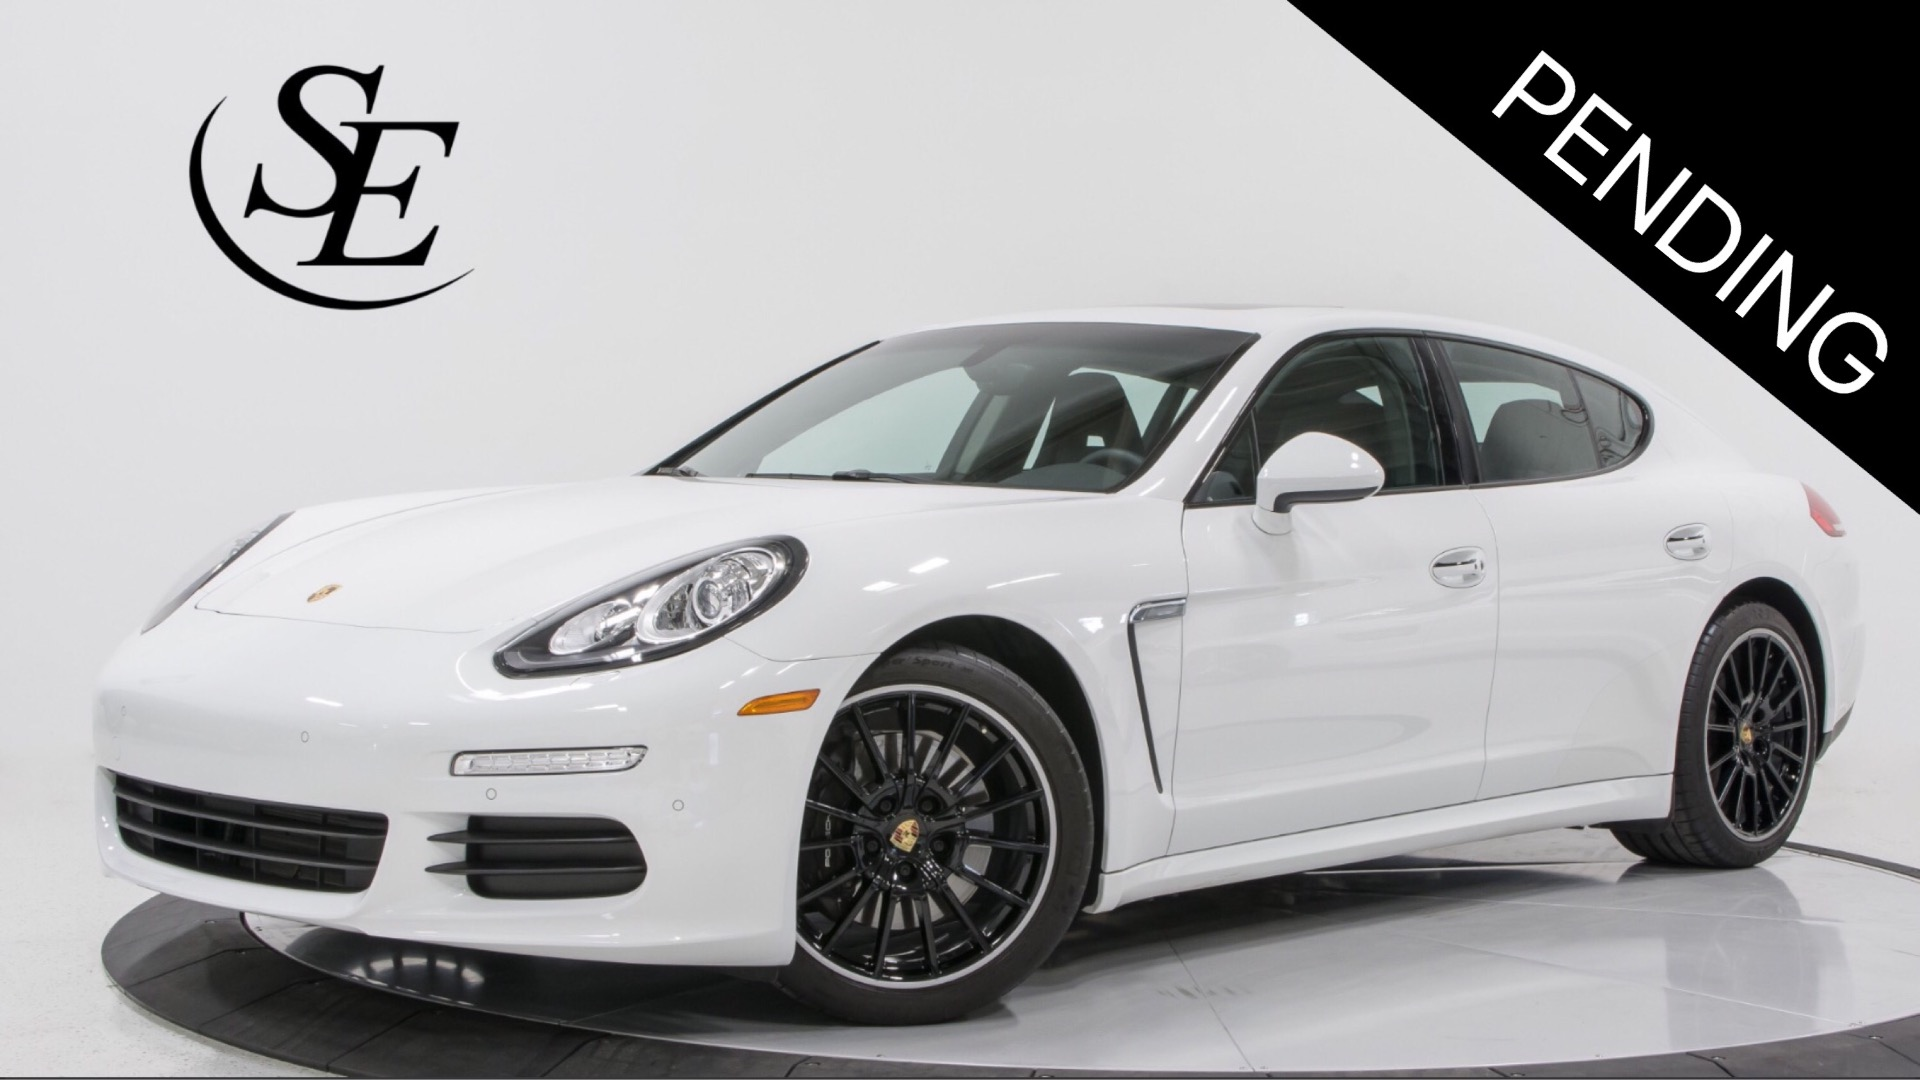 2016 Porsche Panamera Edition 4k Miles Stock 22585 For Sale Near Pompano Beach Fl Fl Porsche Dealer